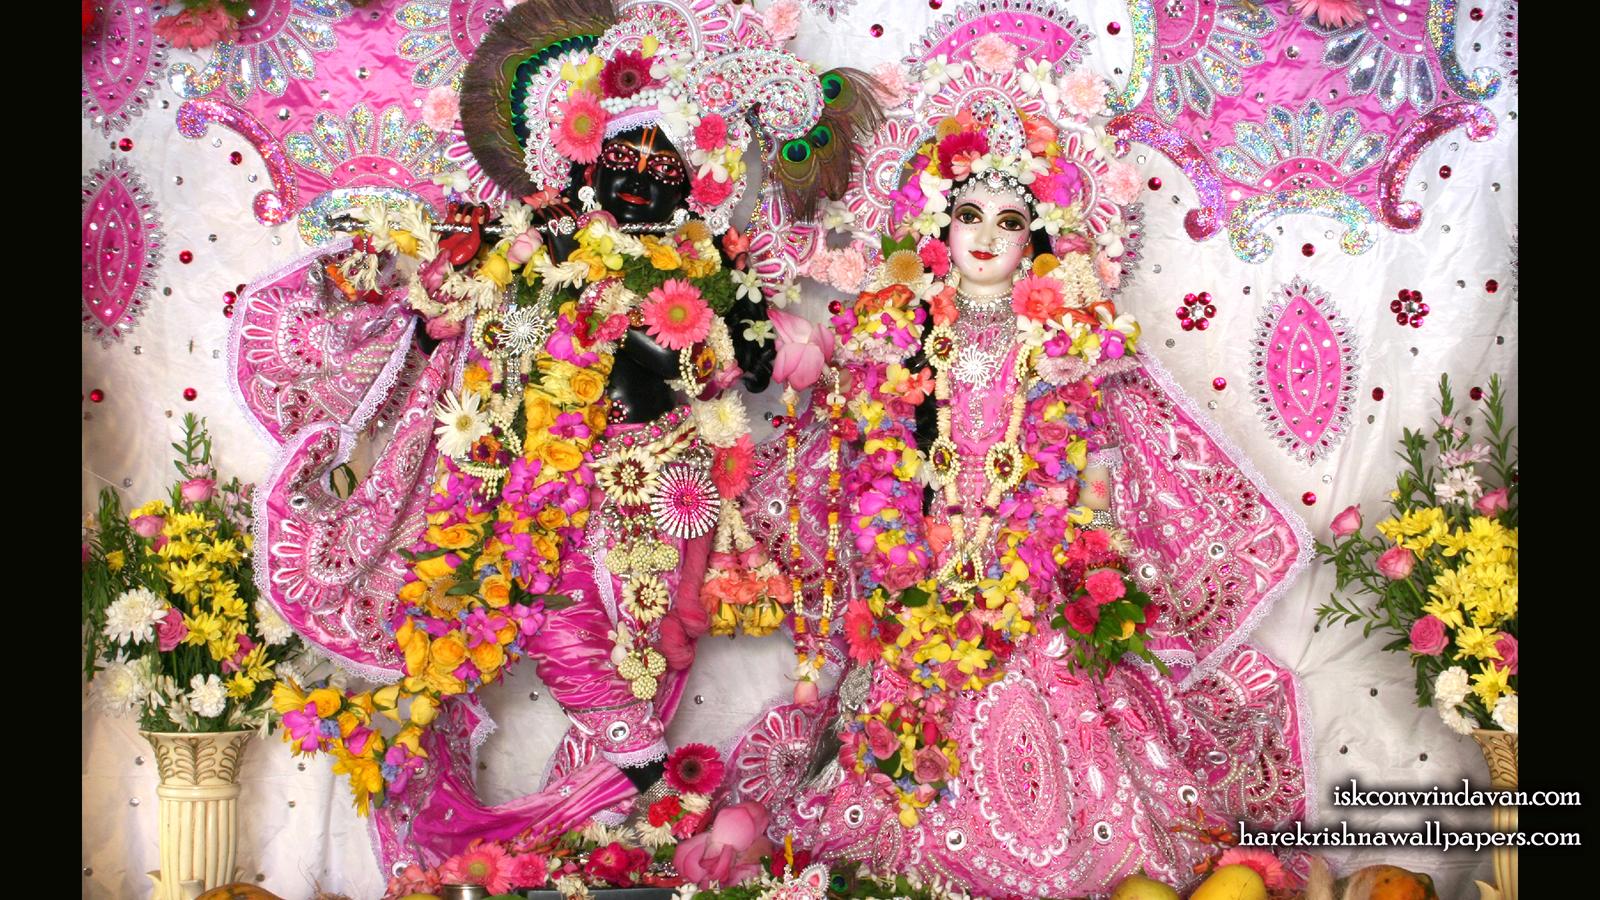 Sri Sri Radha Shyamsundar Wallpaper (015) Size 1600x900 Download